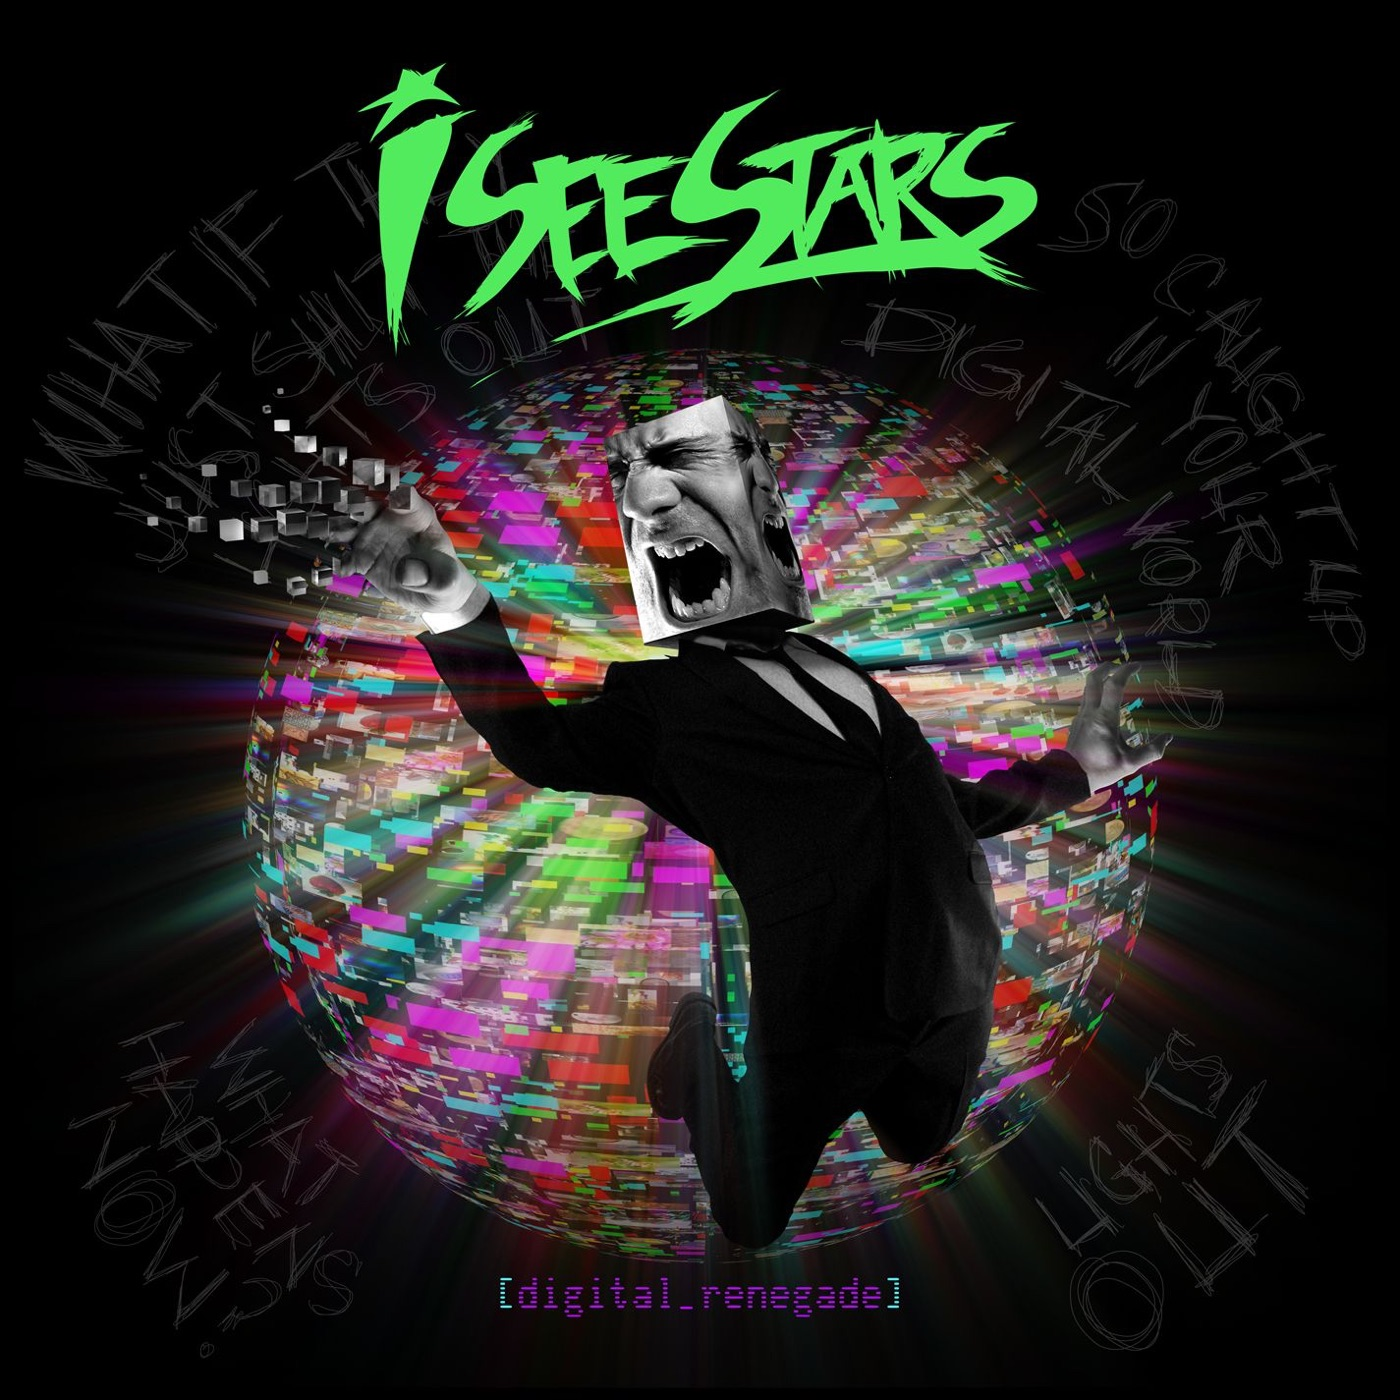 I See Stars - Digital Renegade (2012)